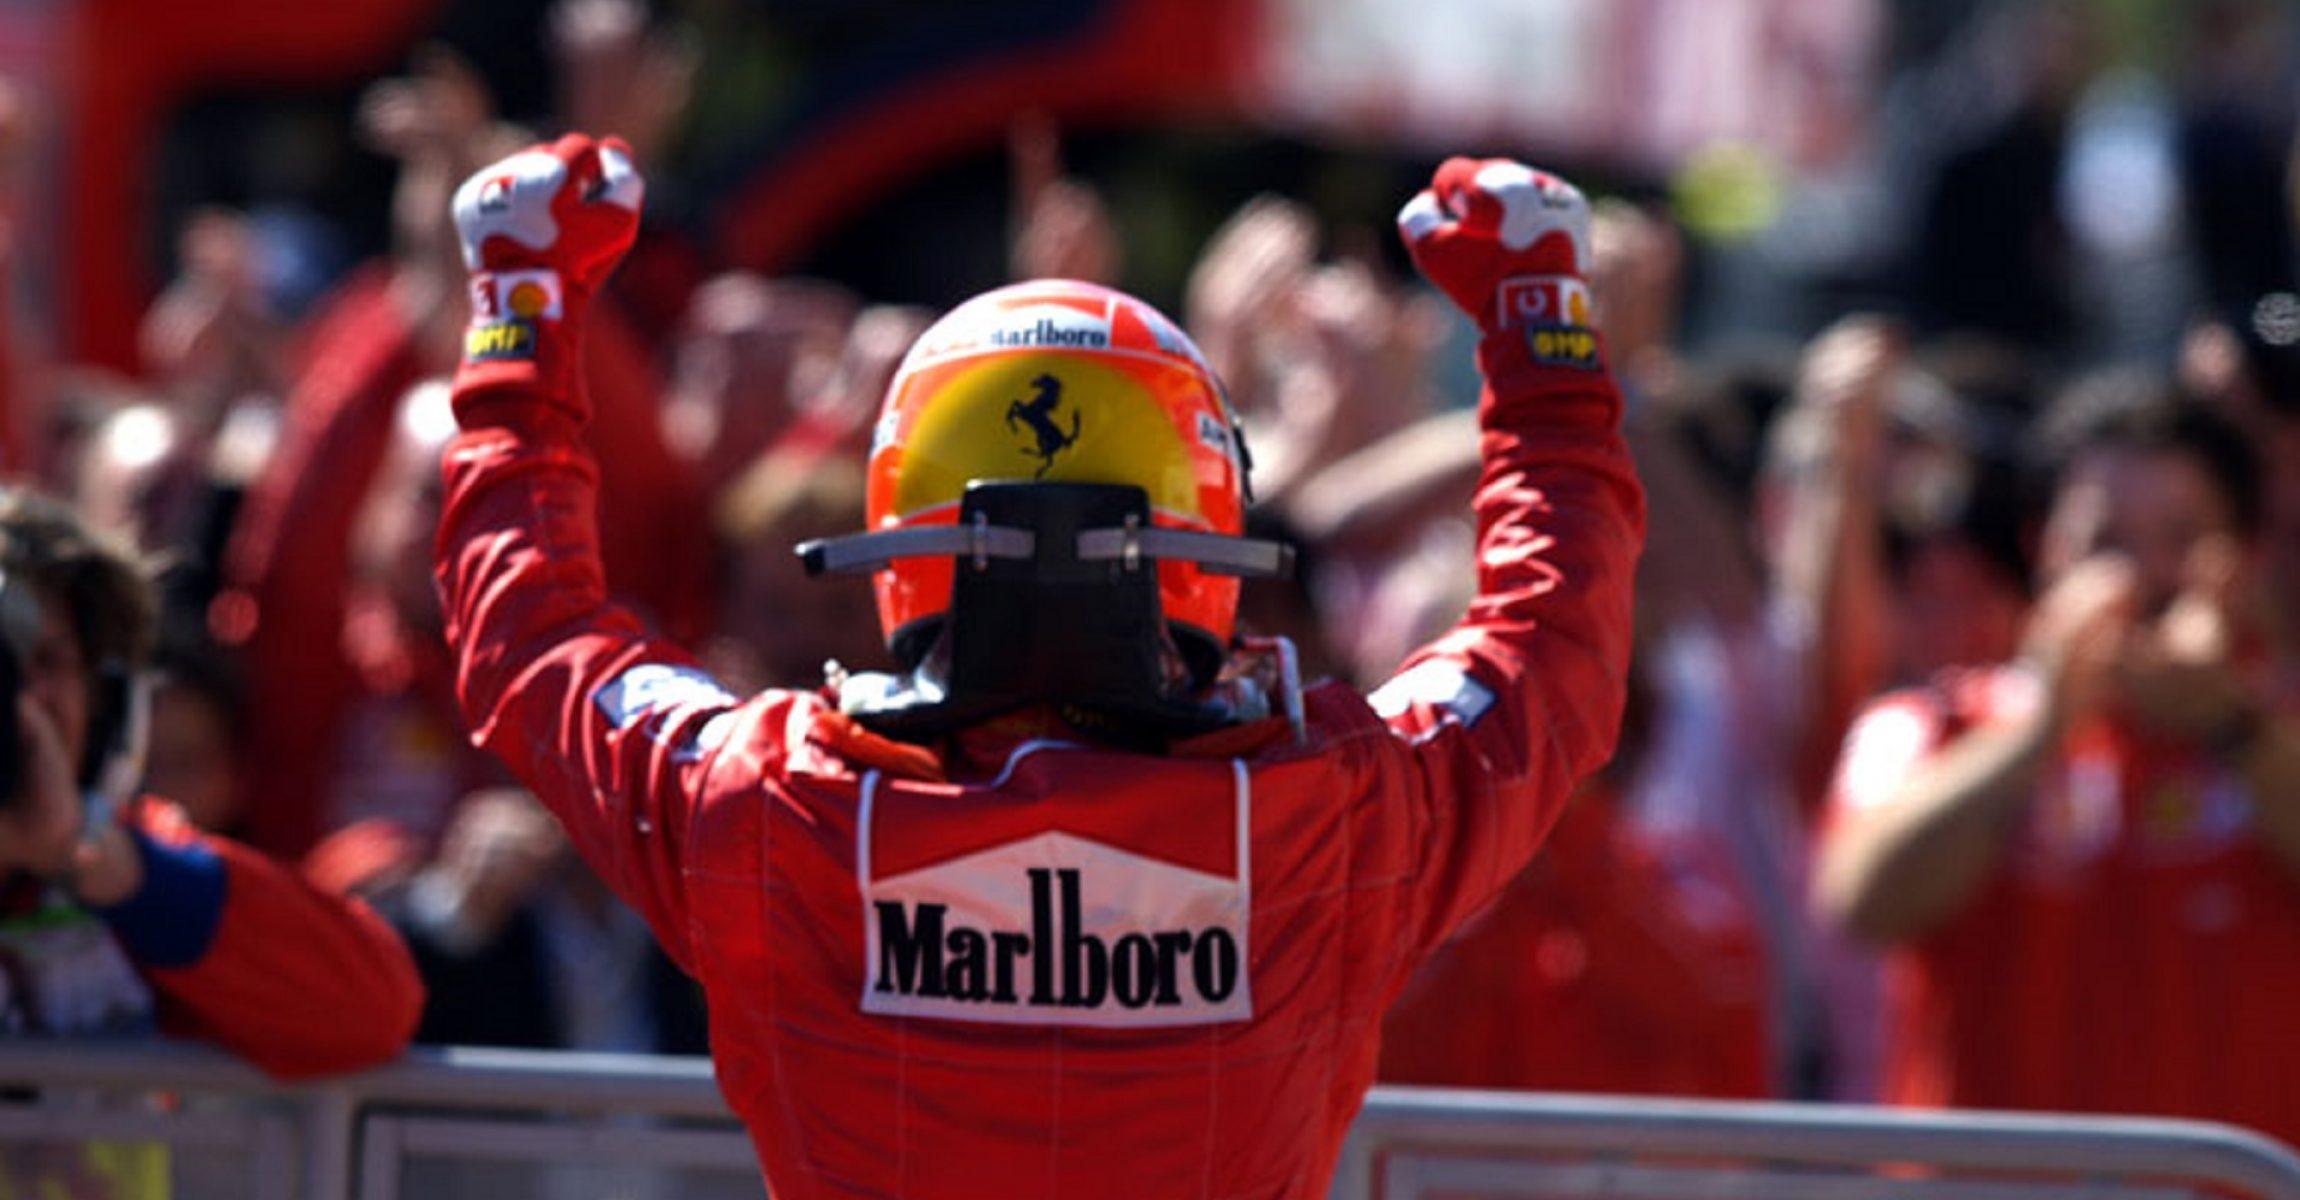 OLYMPUS DIGITAL CAMERA Michael Schumacher Ferrari 2001